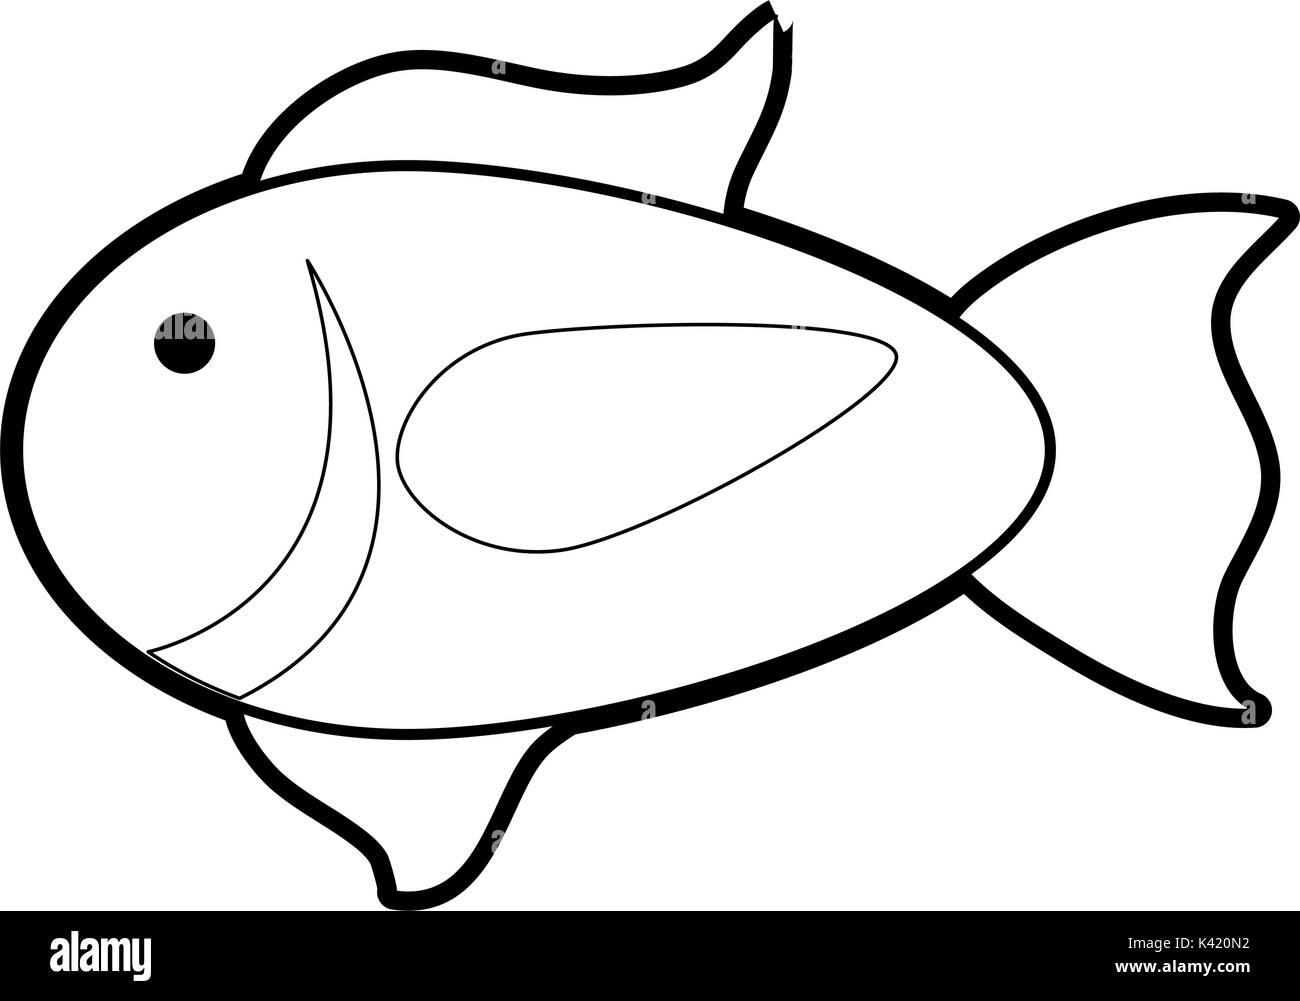 Isolated fish design - Stock Image